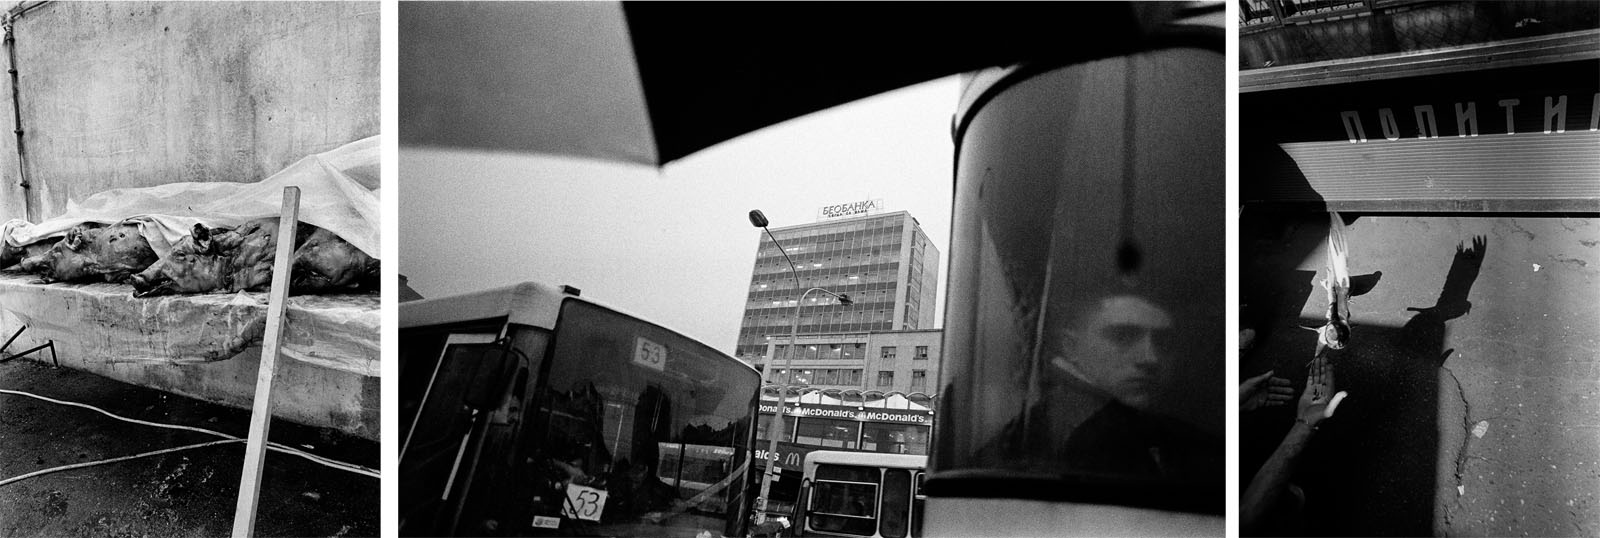 Art and Documentary Photography - Loading BGD___Fabio_Sgroi_013.jpg